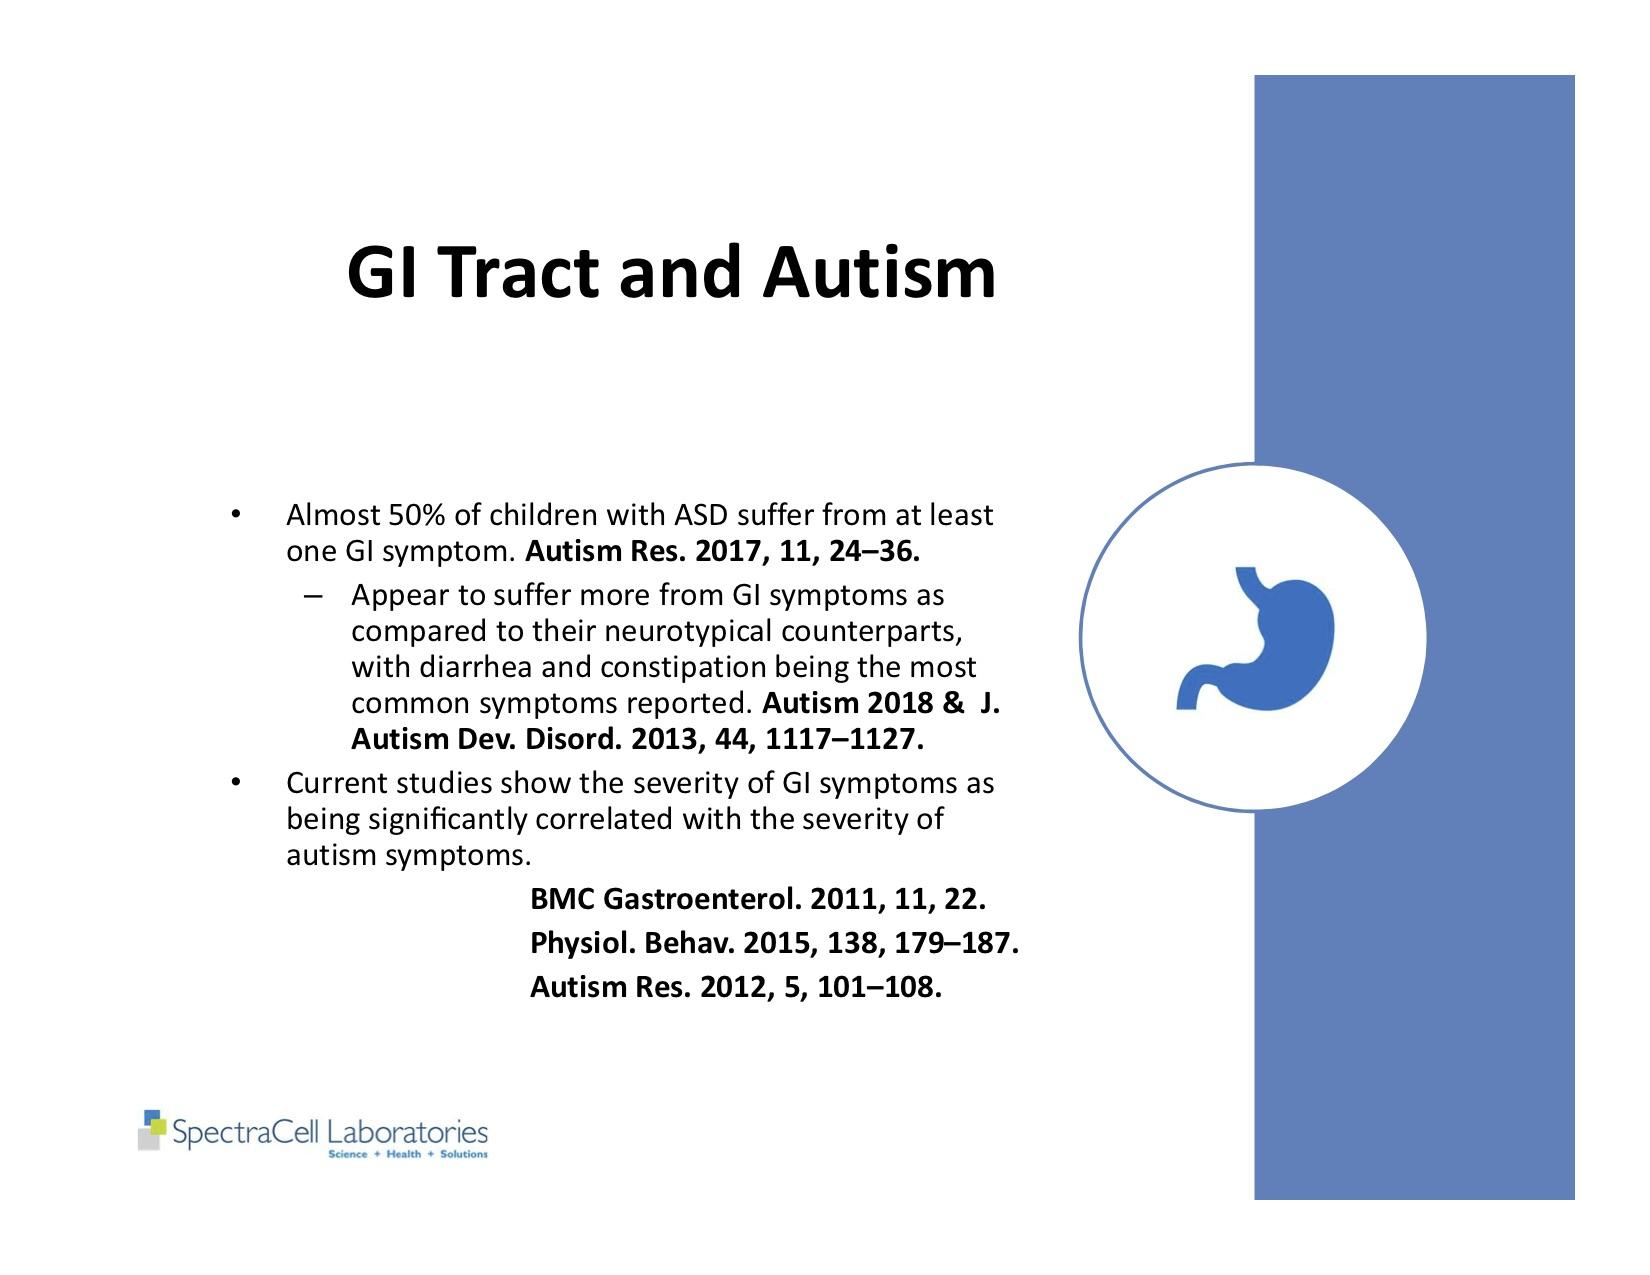 Autism and Thyroid slides 19.jpg